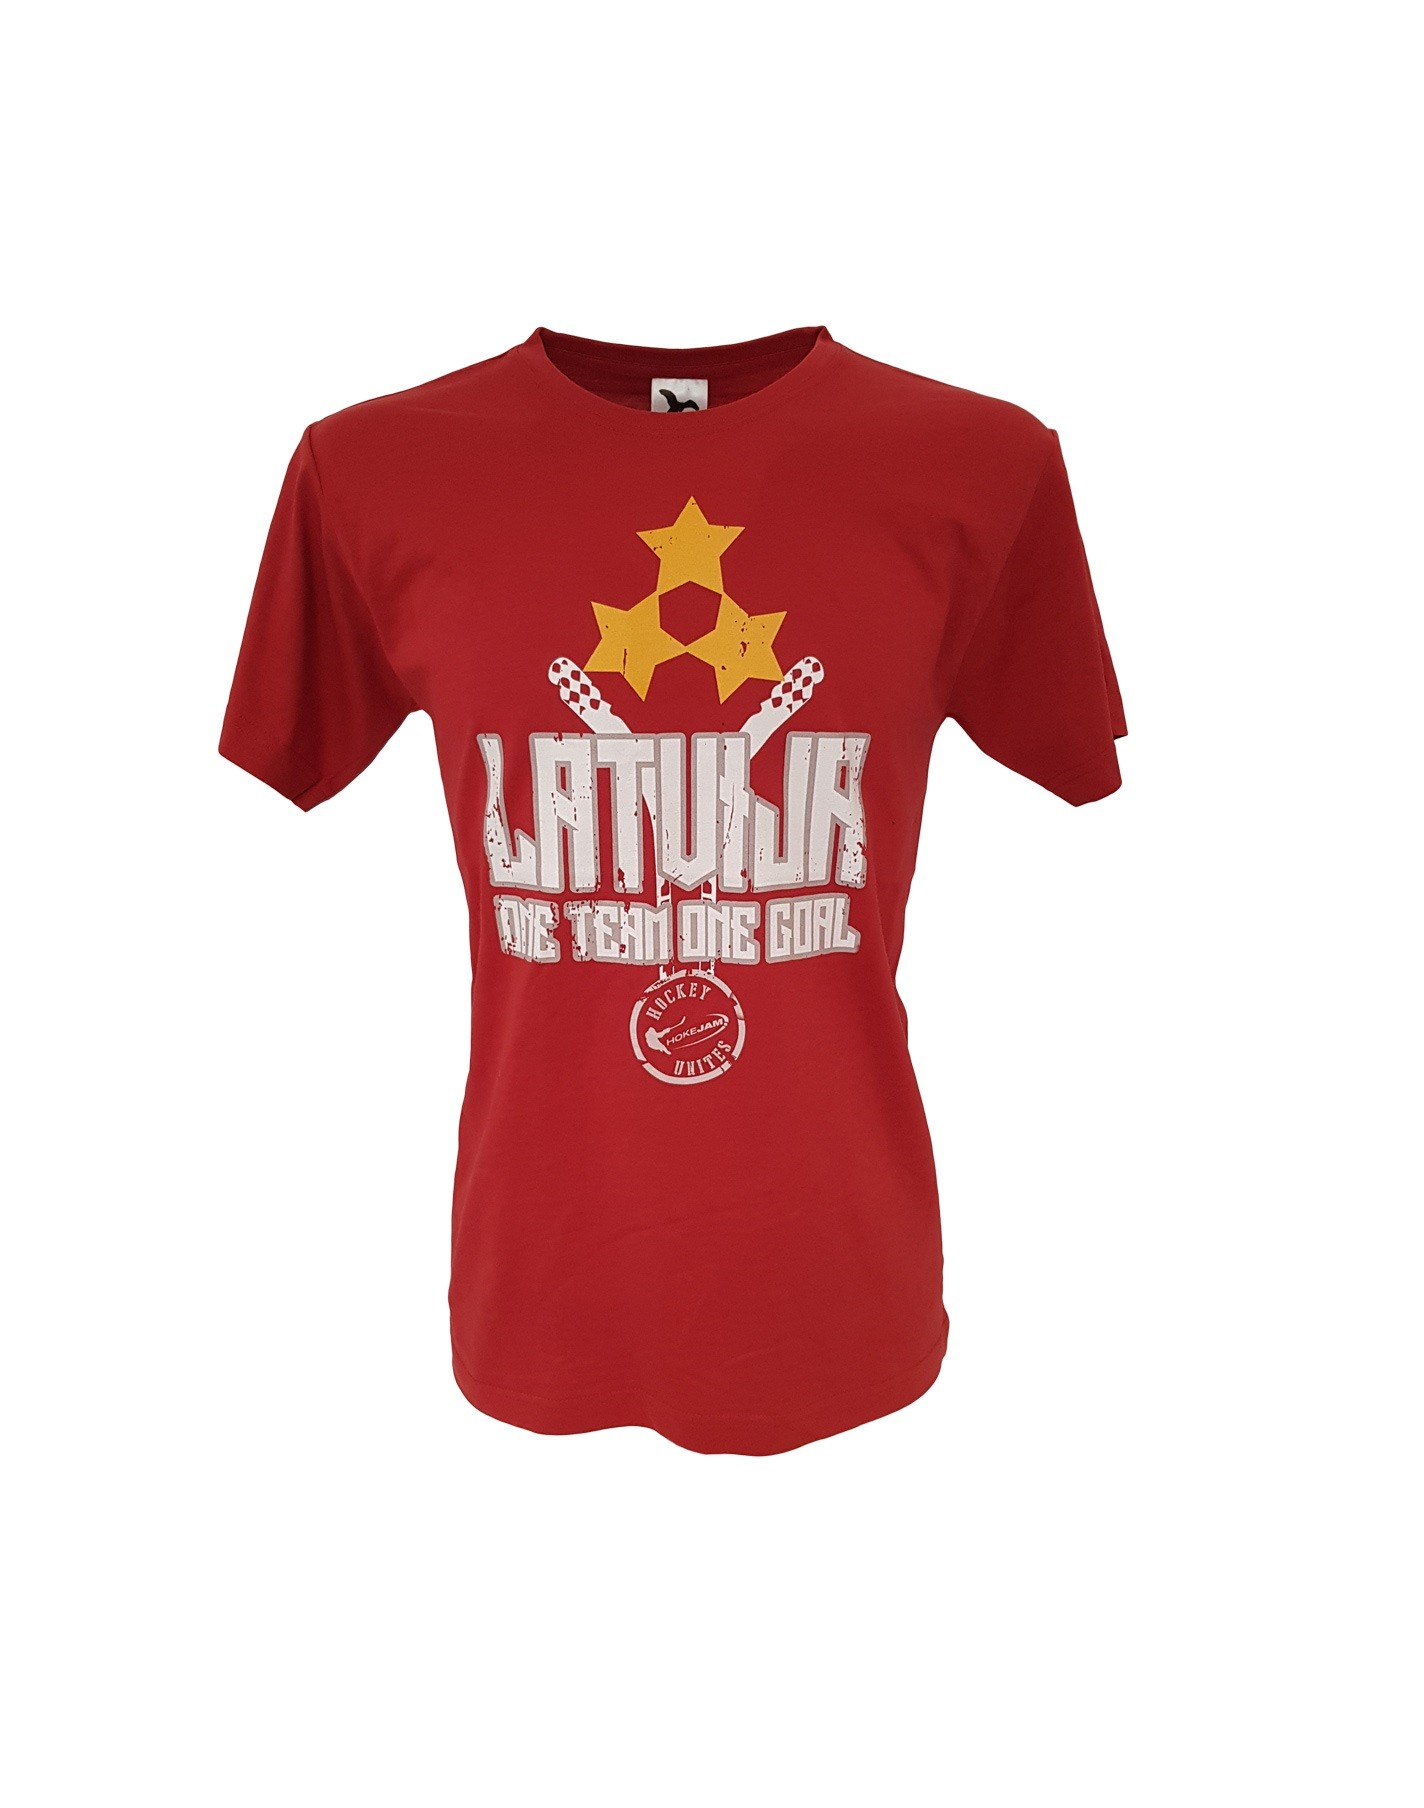 HOKEJAM.LV Latvija One Team One Goal Youth T-Shirt